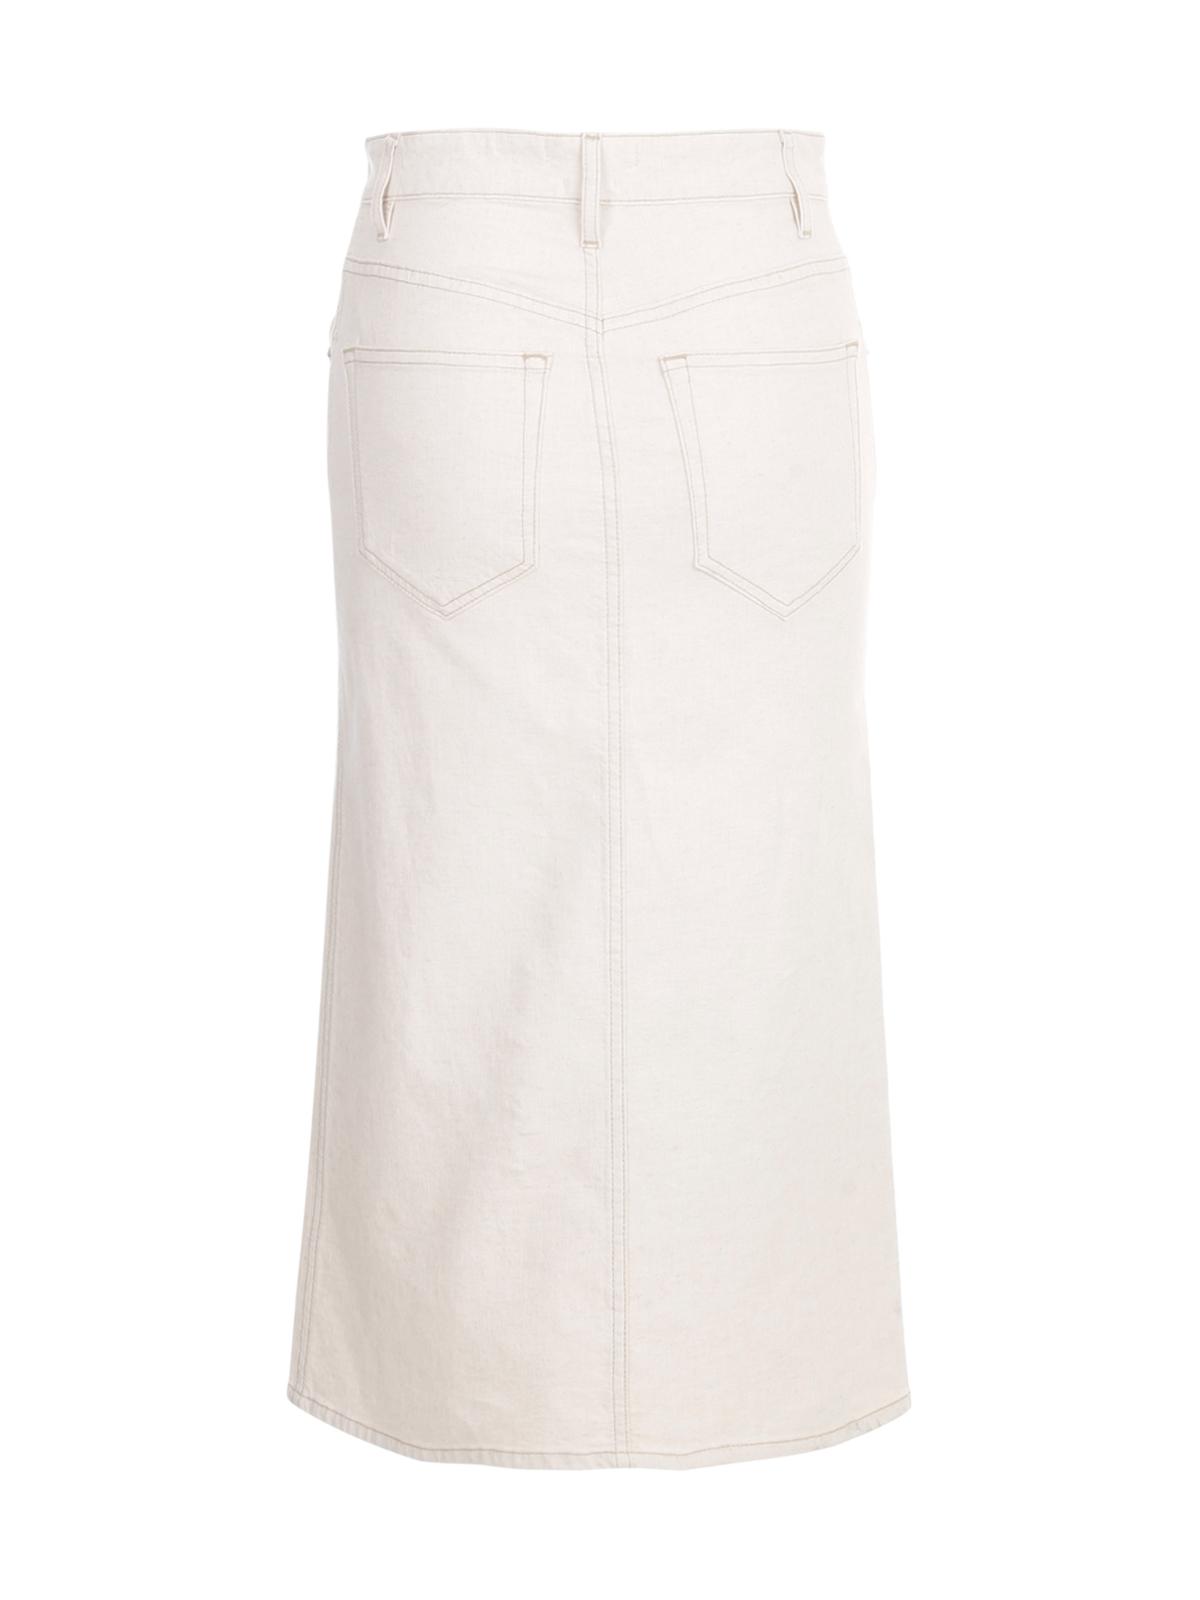 Picture of Isabel Marant Etoile Skirt